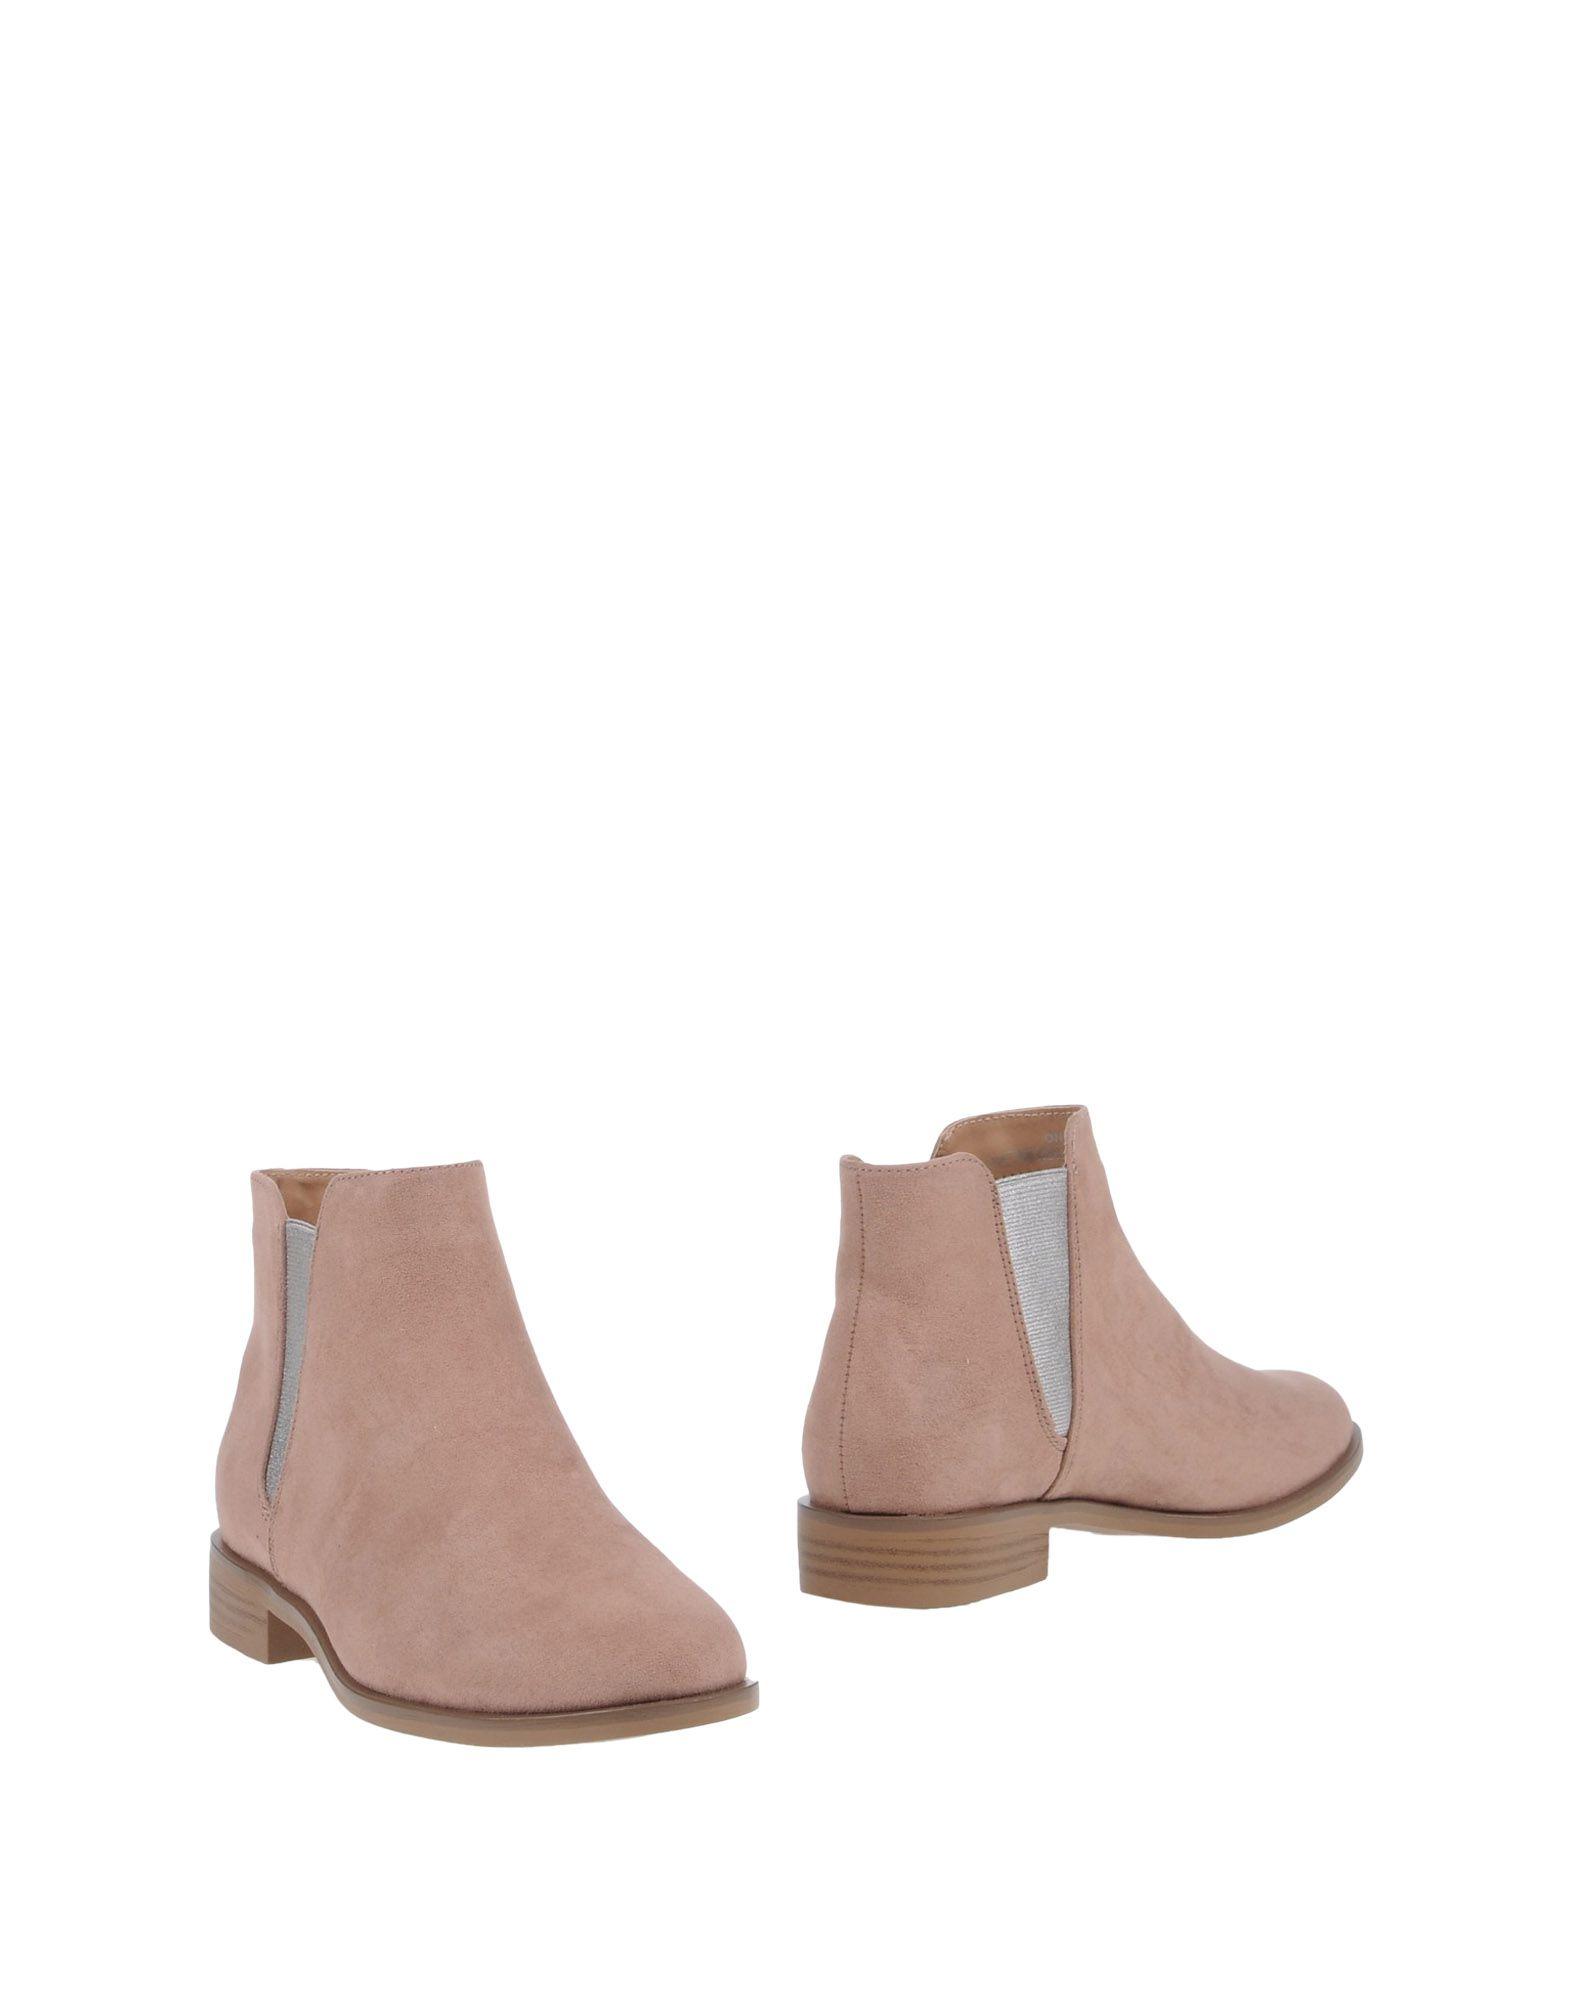 ONLY Полусапоги и высокие ботинки magazzini del sale полусапоги и высокие ботинки